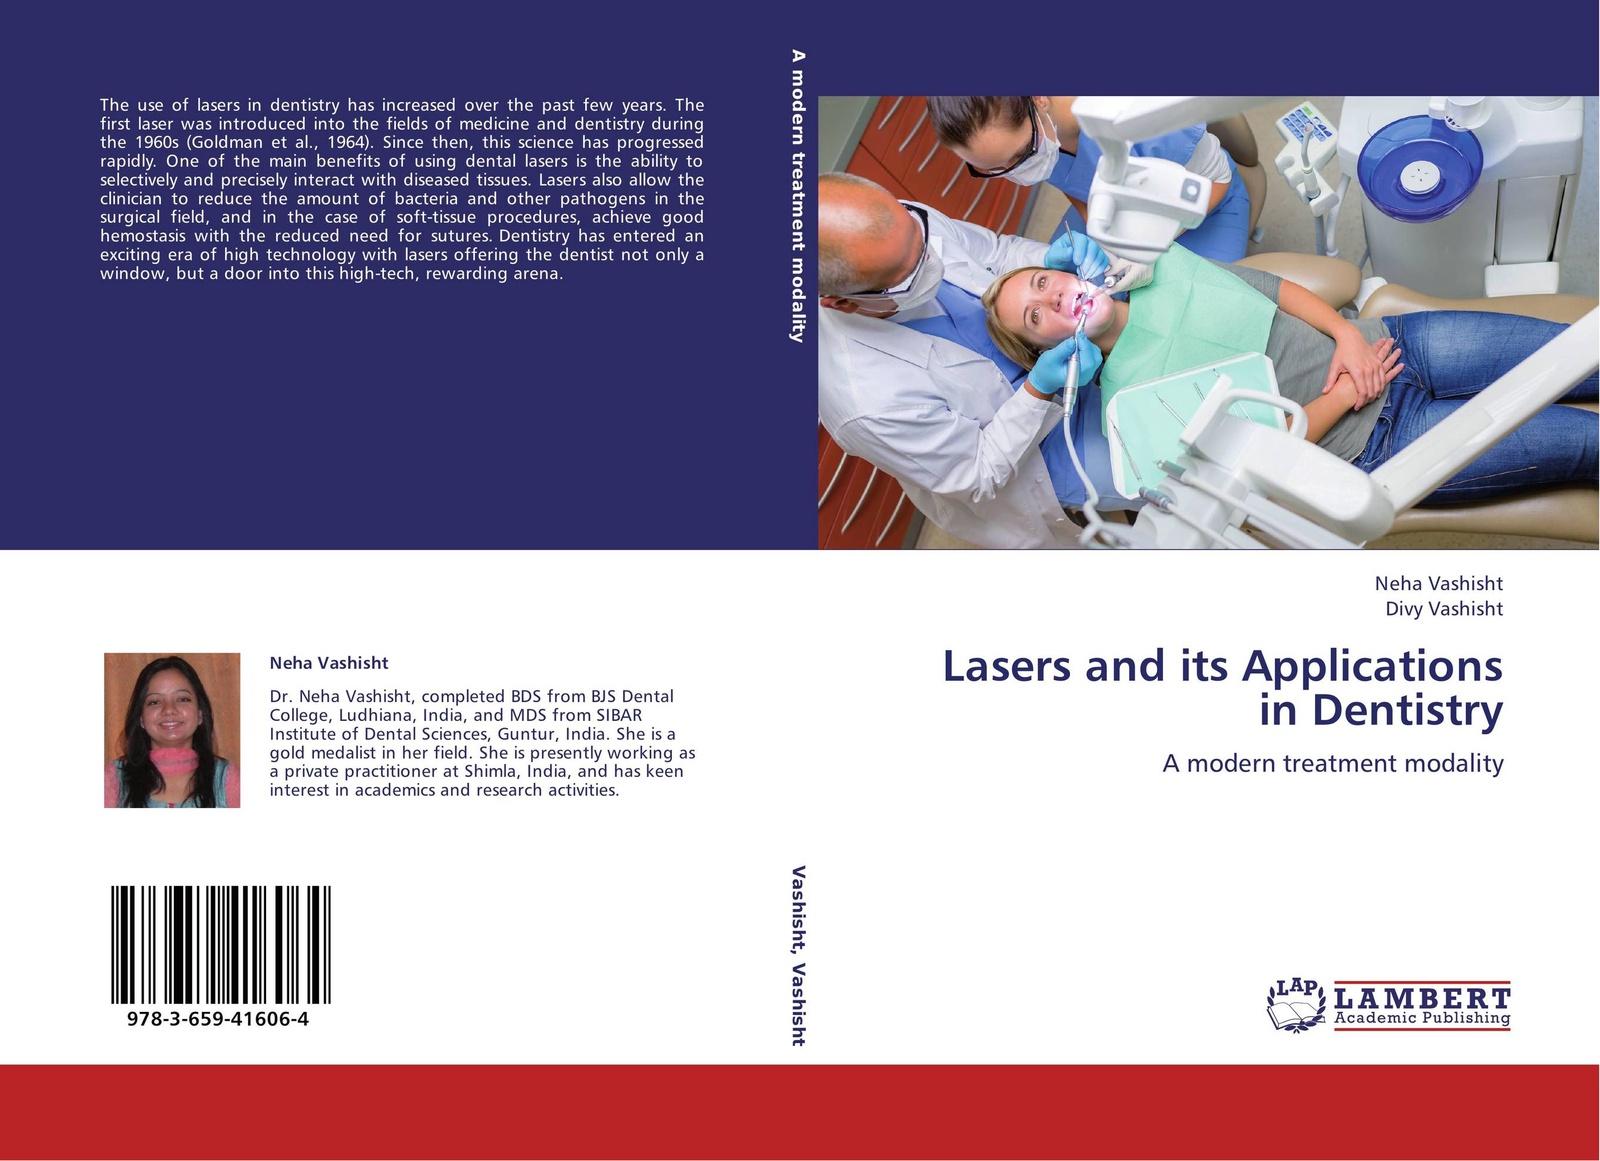 Neha Vashisht and Divy Vashisht Lasers and its Applications in Dentistry laser dentistry